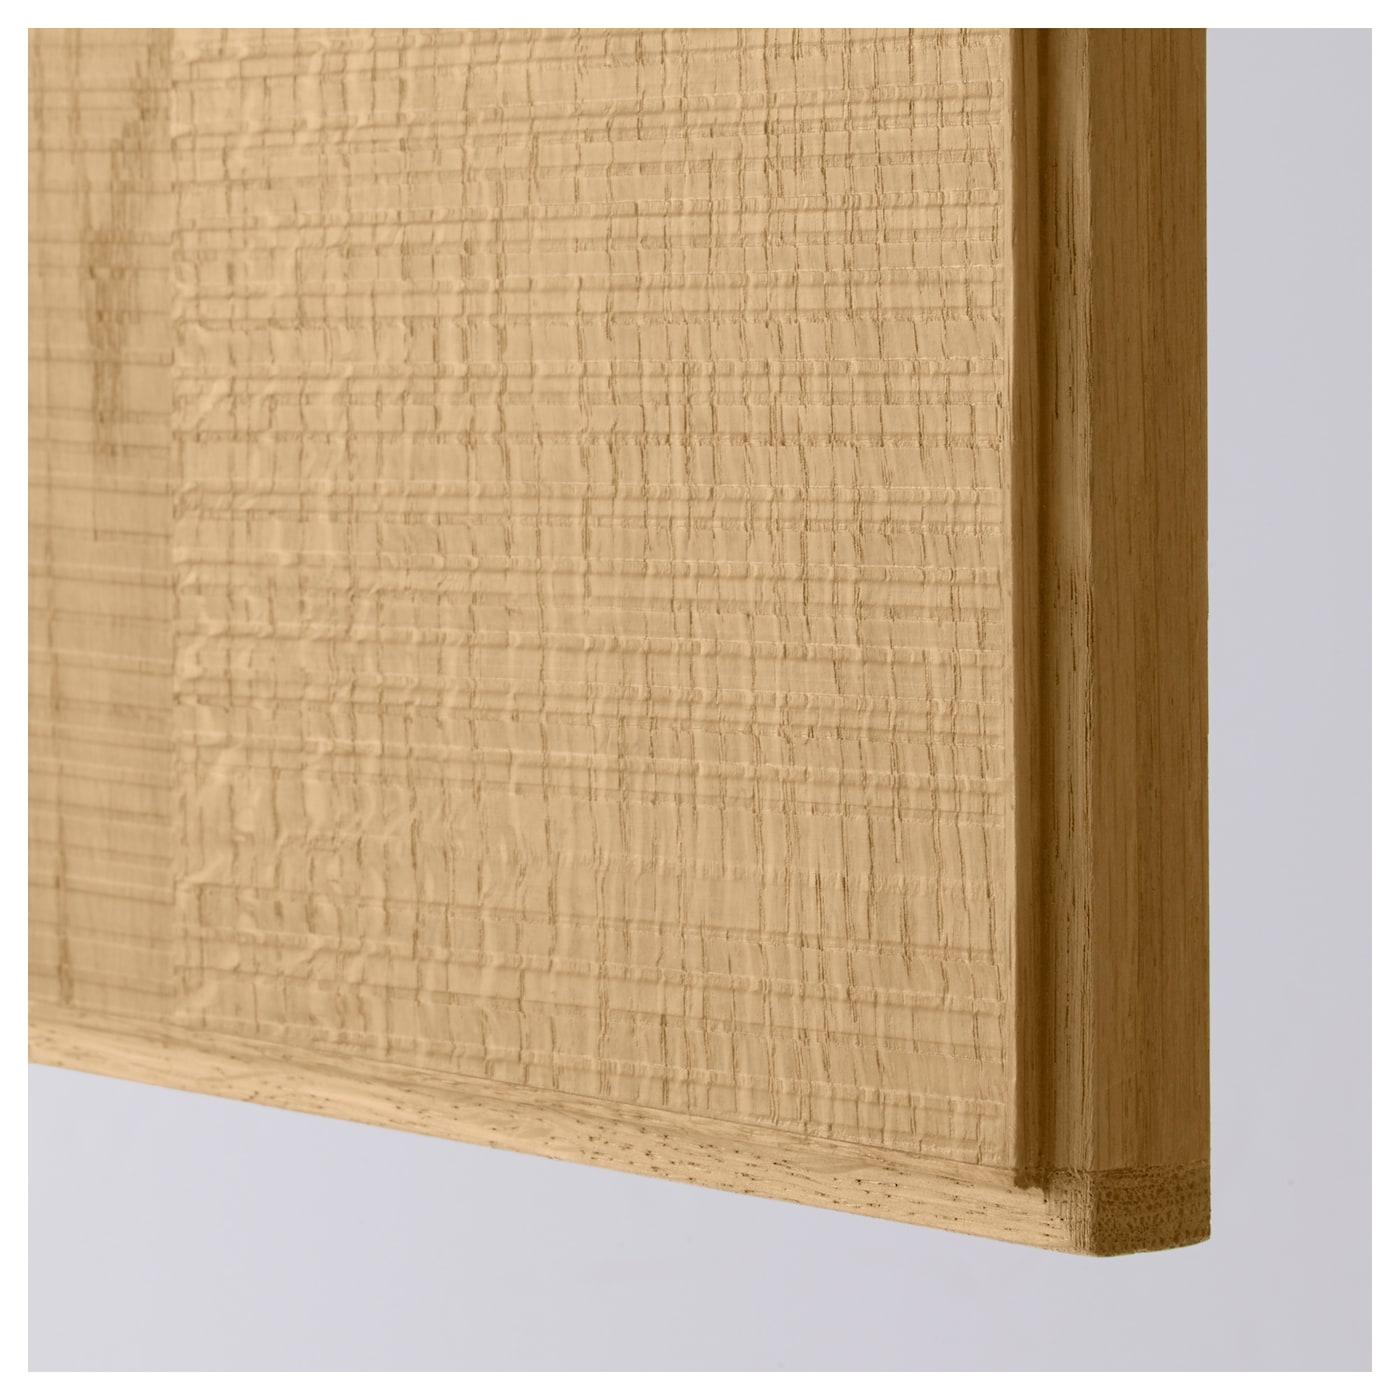 hyttan door has a solid oak frame and rough cut oak veneer panel with